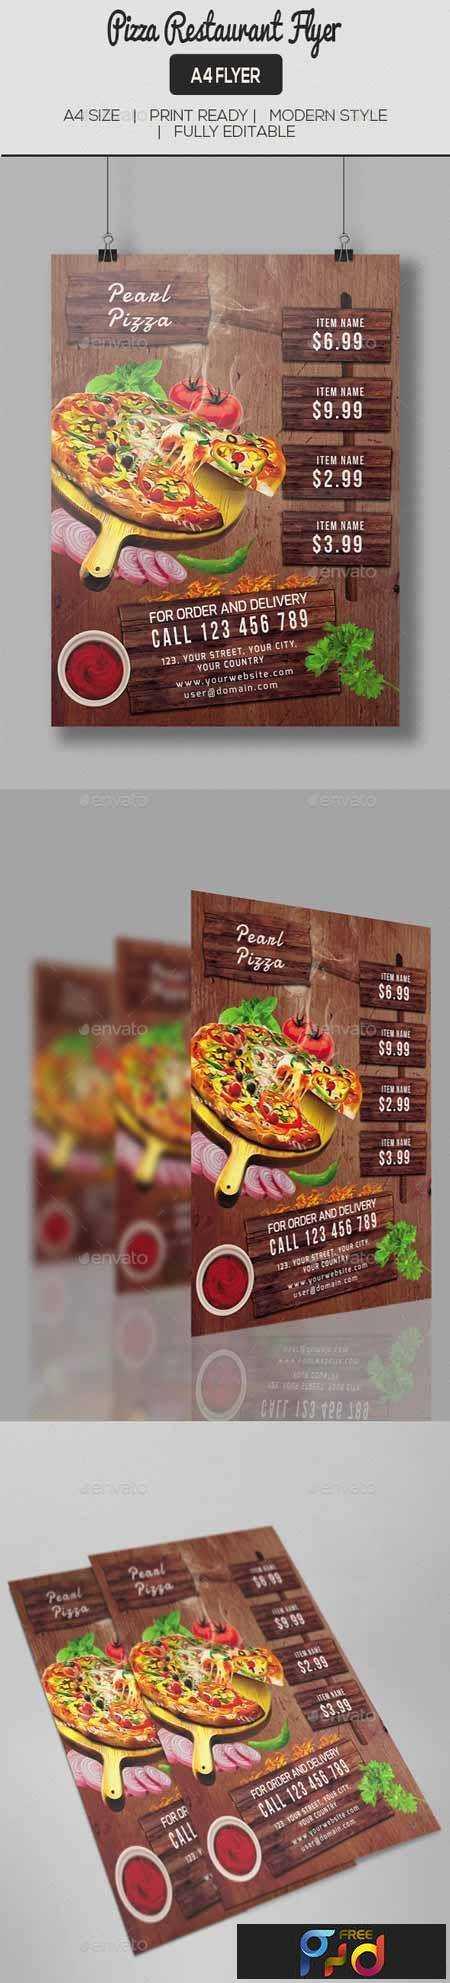 freepsdvn-com_1453913516_pizza-restaurant-flyer-11657805